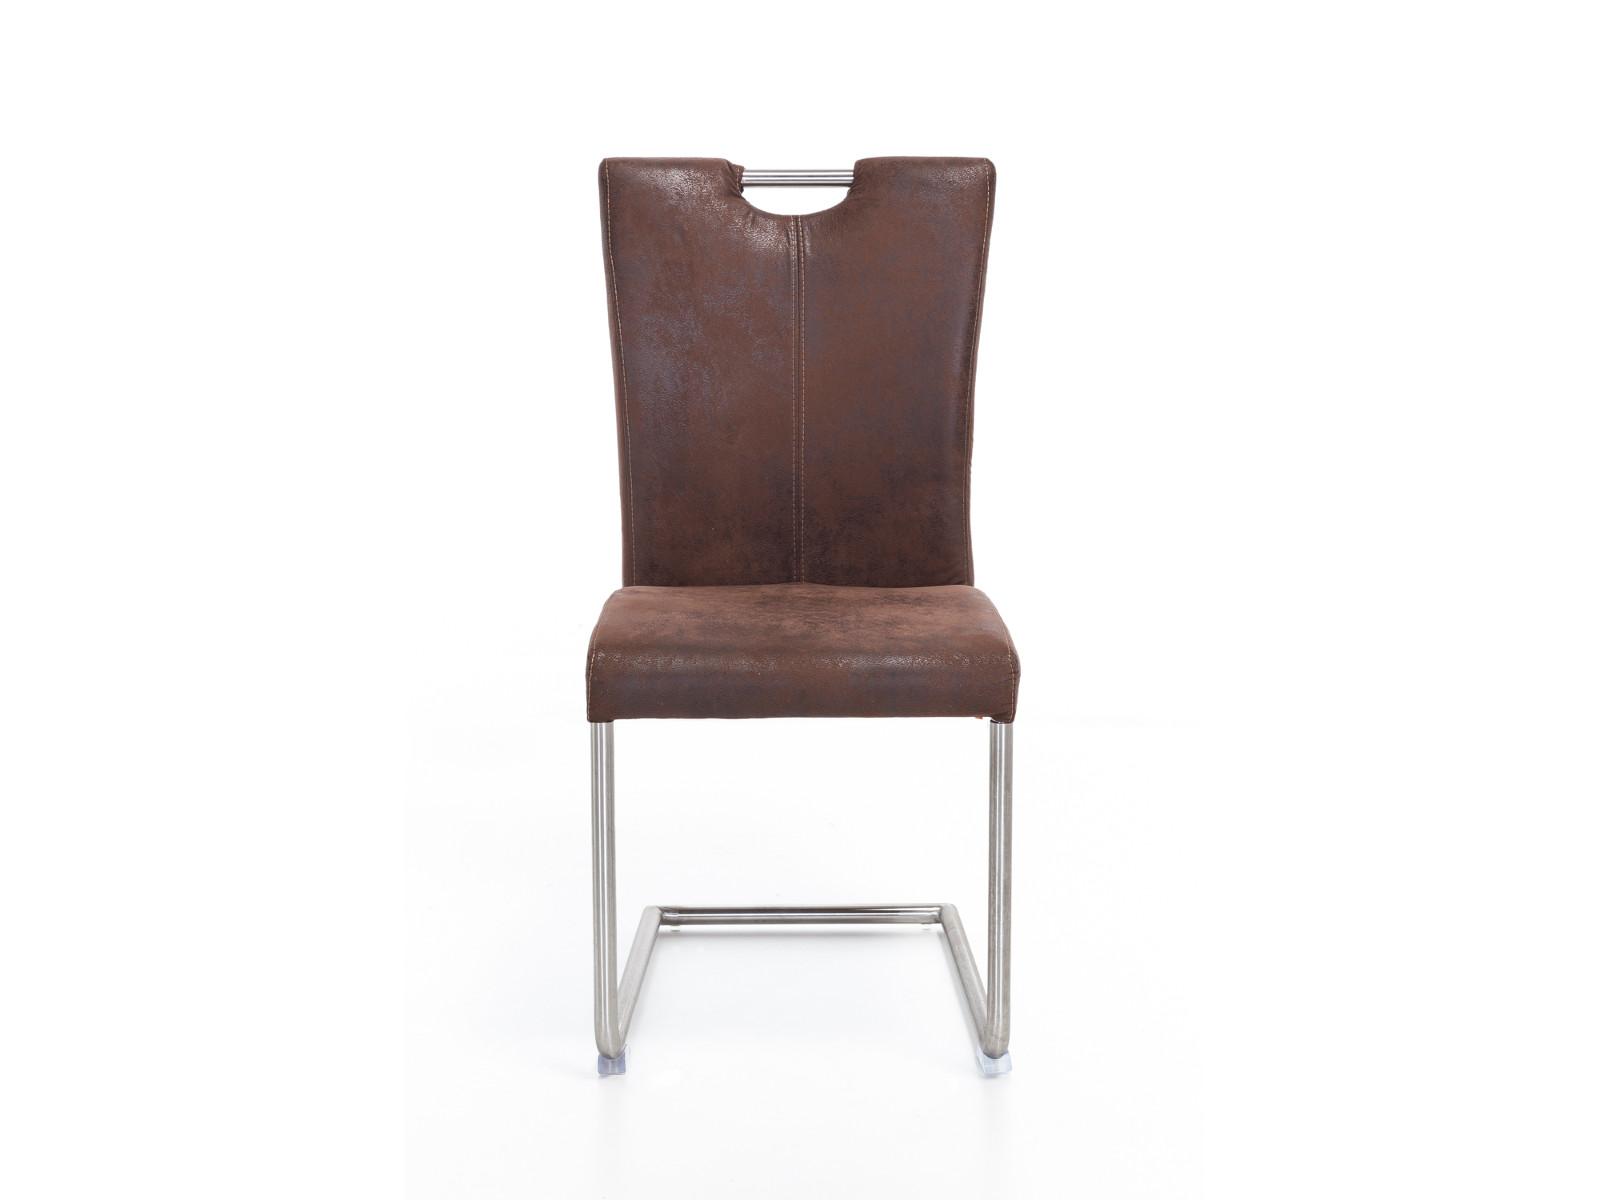 4 x schwingstuhl reefton stoff braun freischwinger. Black Bedroom Furniture Sets. Home Design Ideas